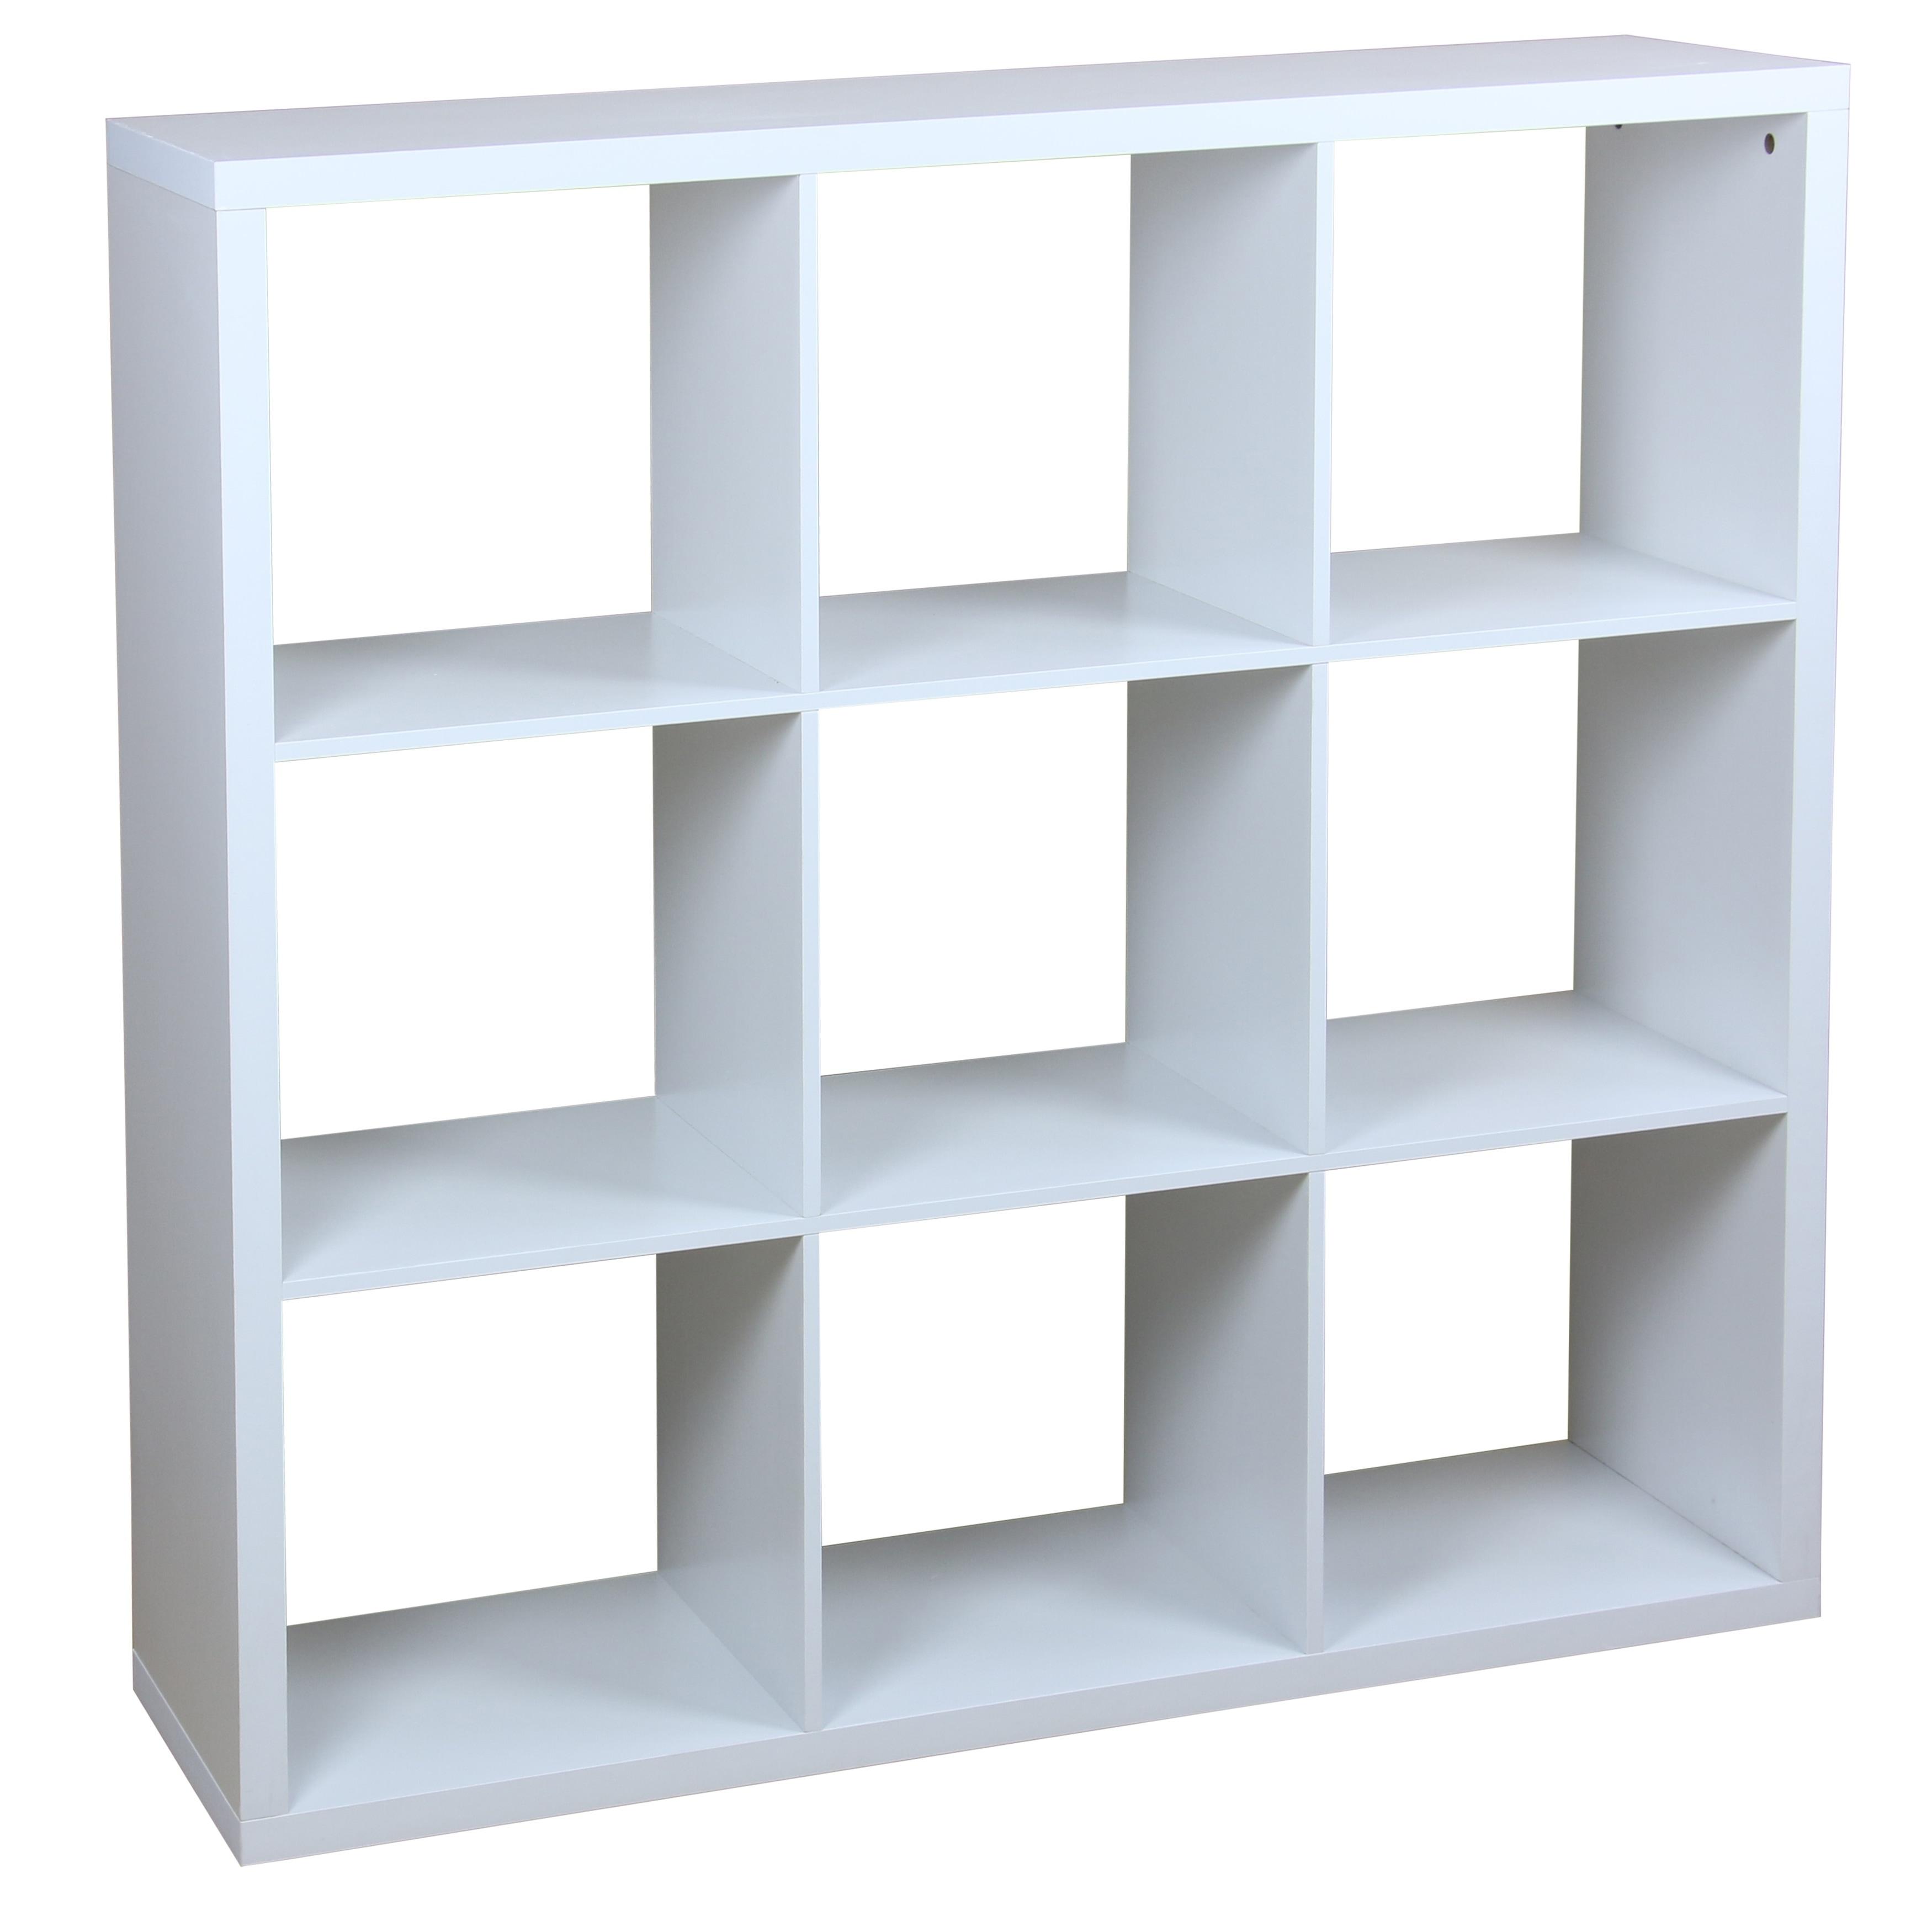 White Wood 9 Cube Open Storage Shelf